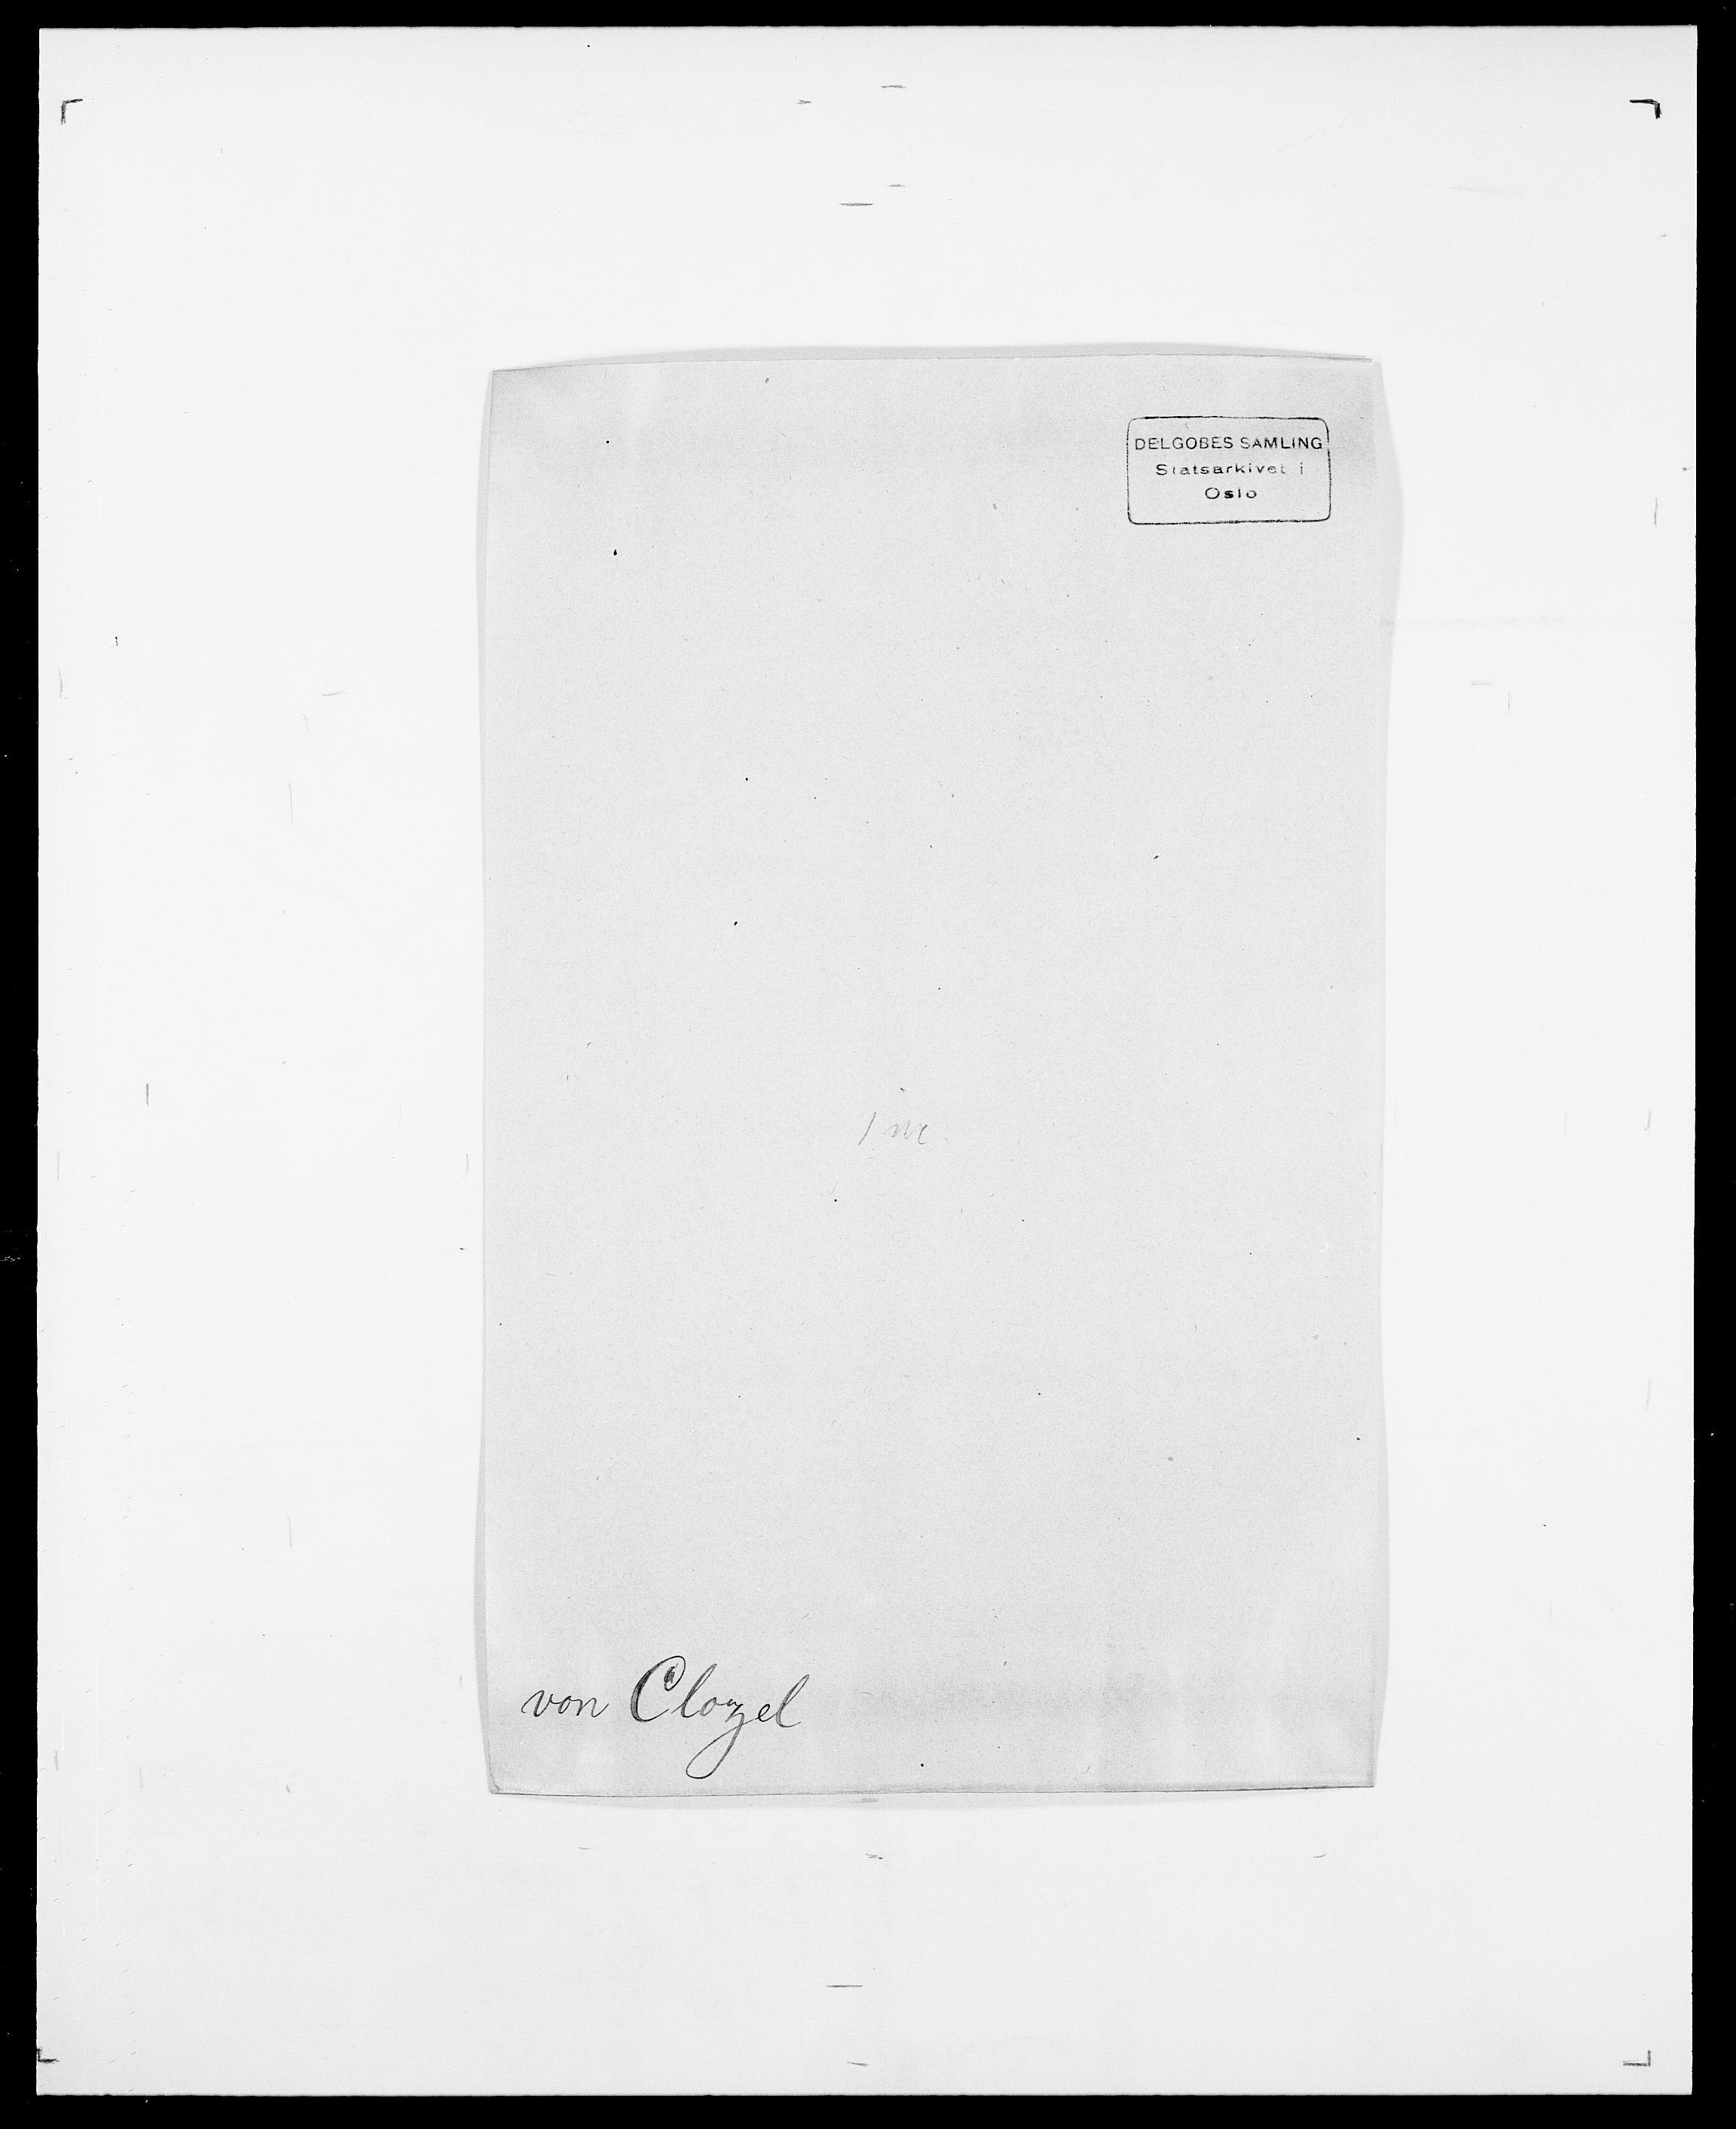 SAO, Delgobe, Charles Antoine - samling, D/Da/L0008: Capjon - Dagenbolt, s. 389